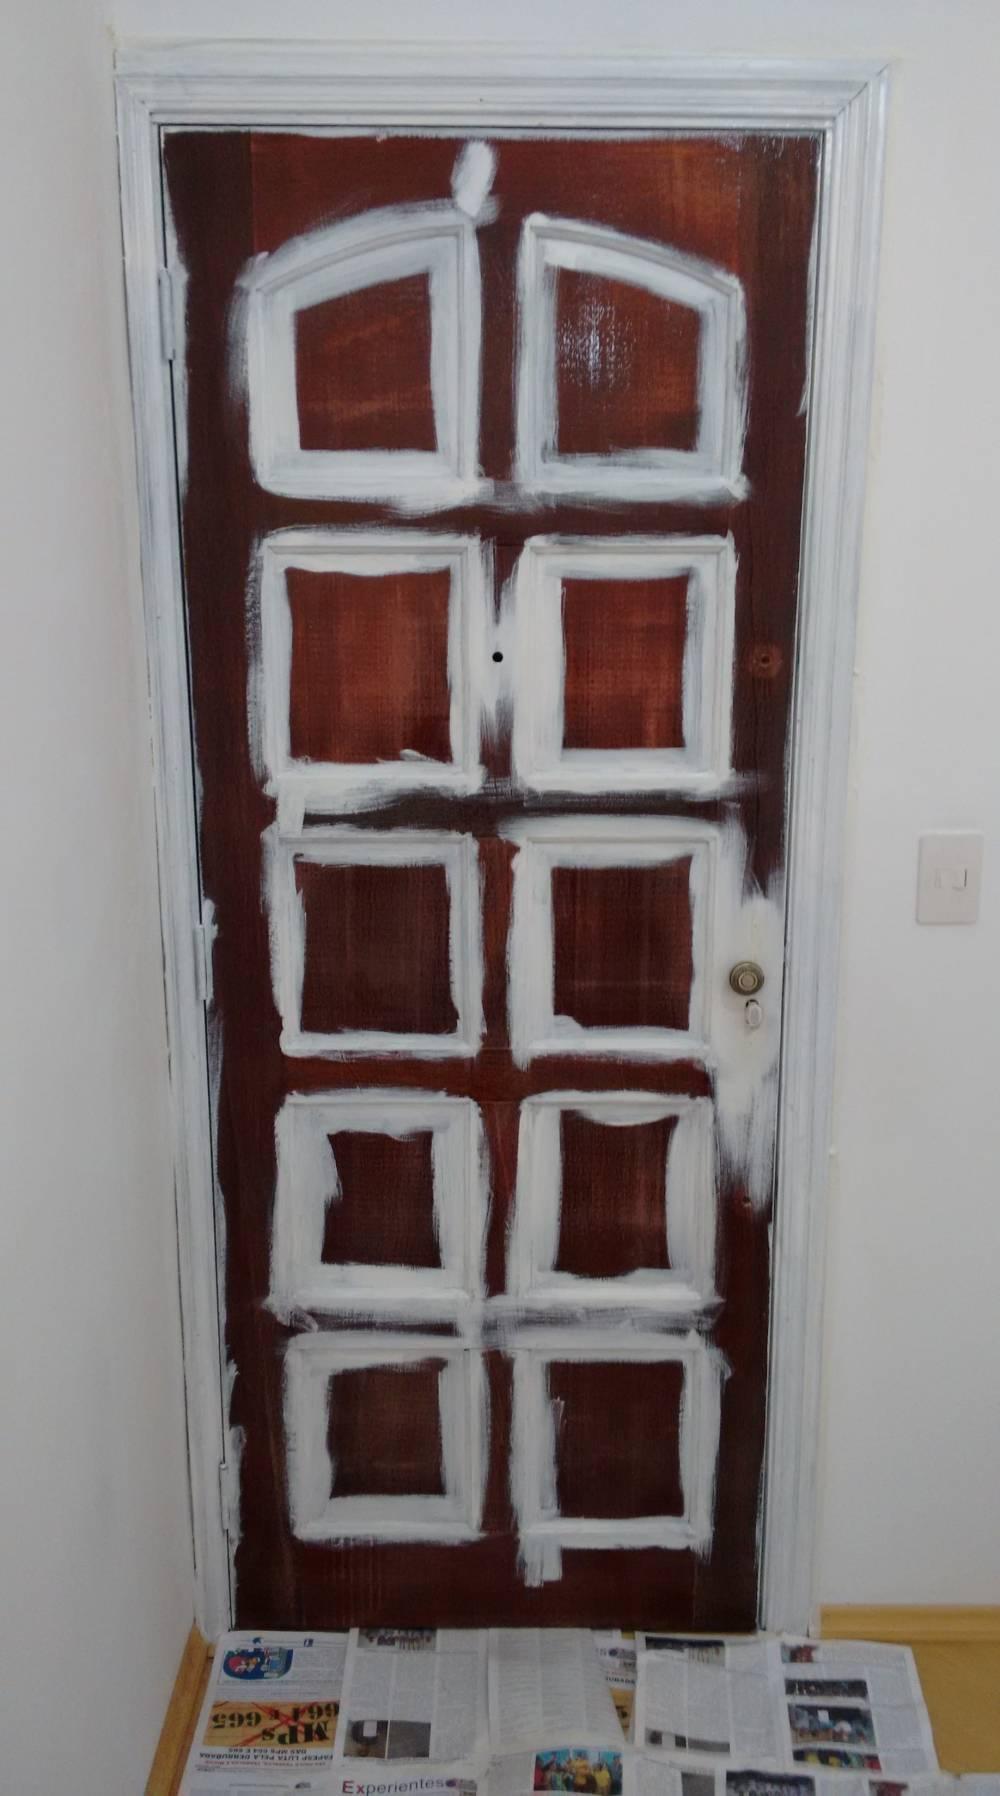 Contratar Empresa para Pequenos Reparos Residenciais na Vila Conde do Pinhal - Reparos Residenciais SP